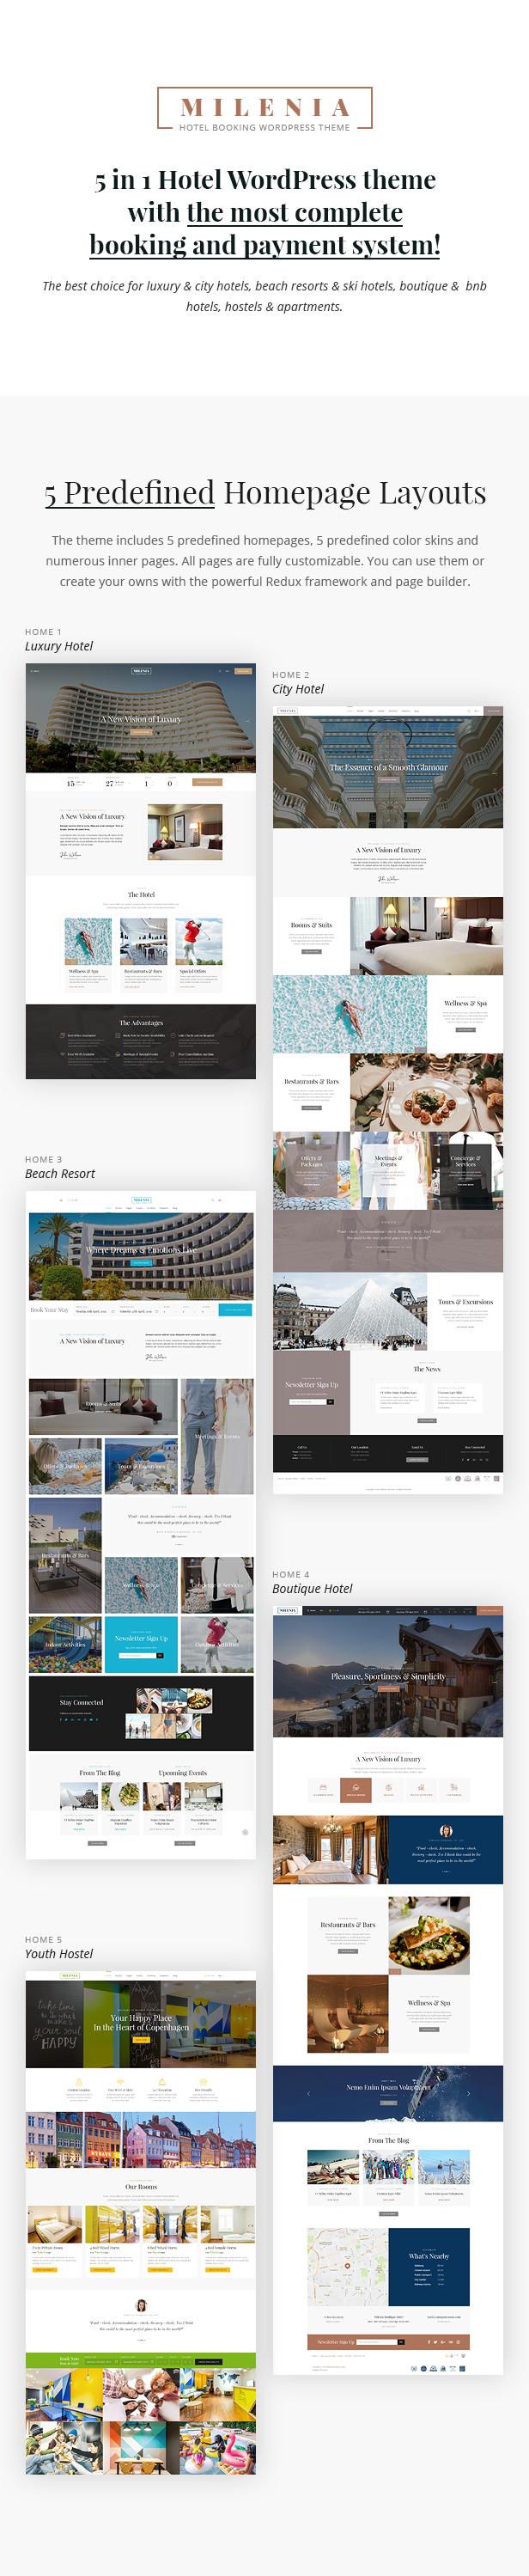 Milenia - Hotel & Booking WordPress Theme - 1